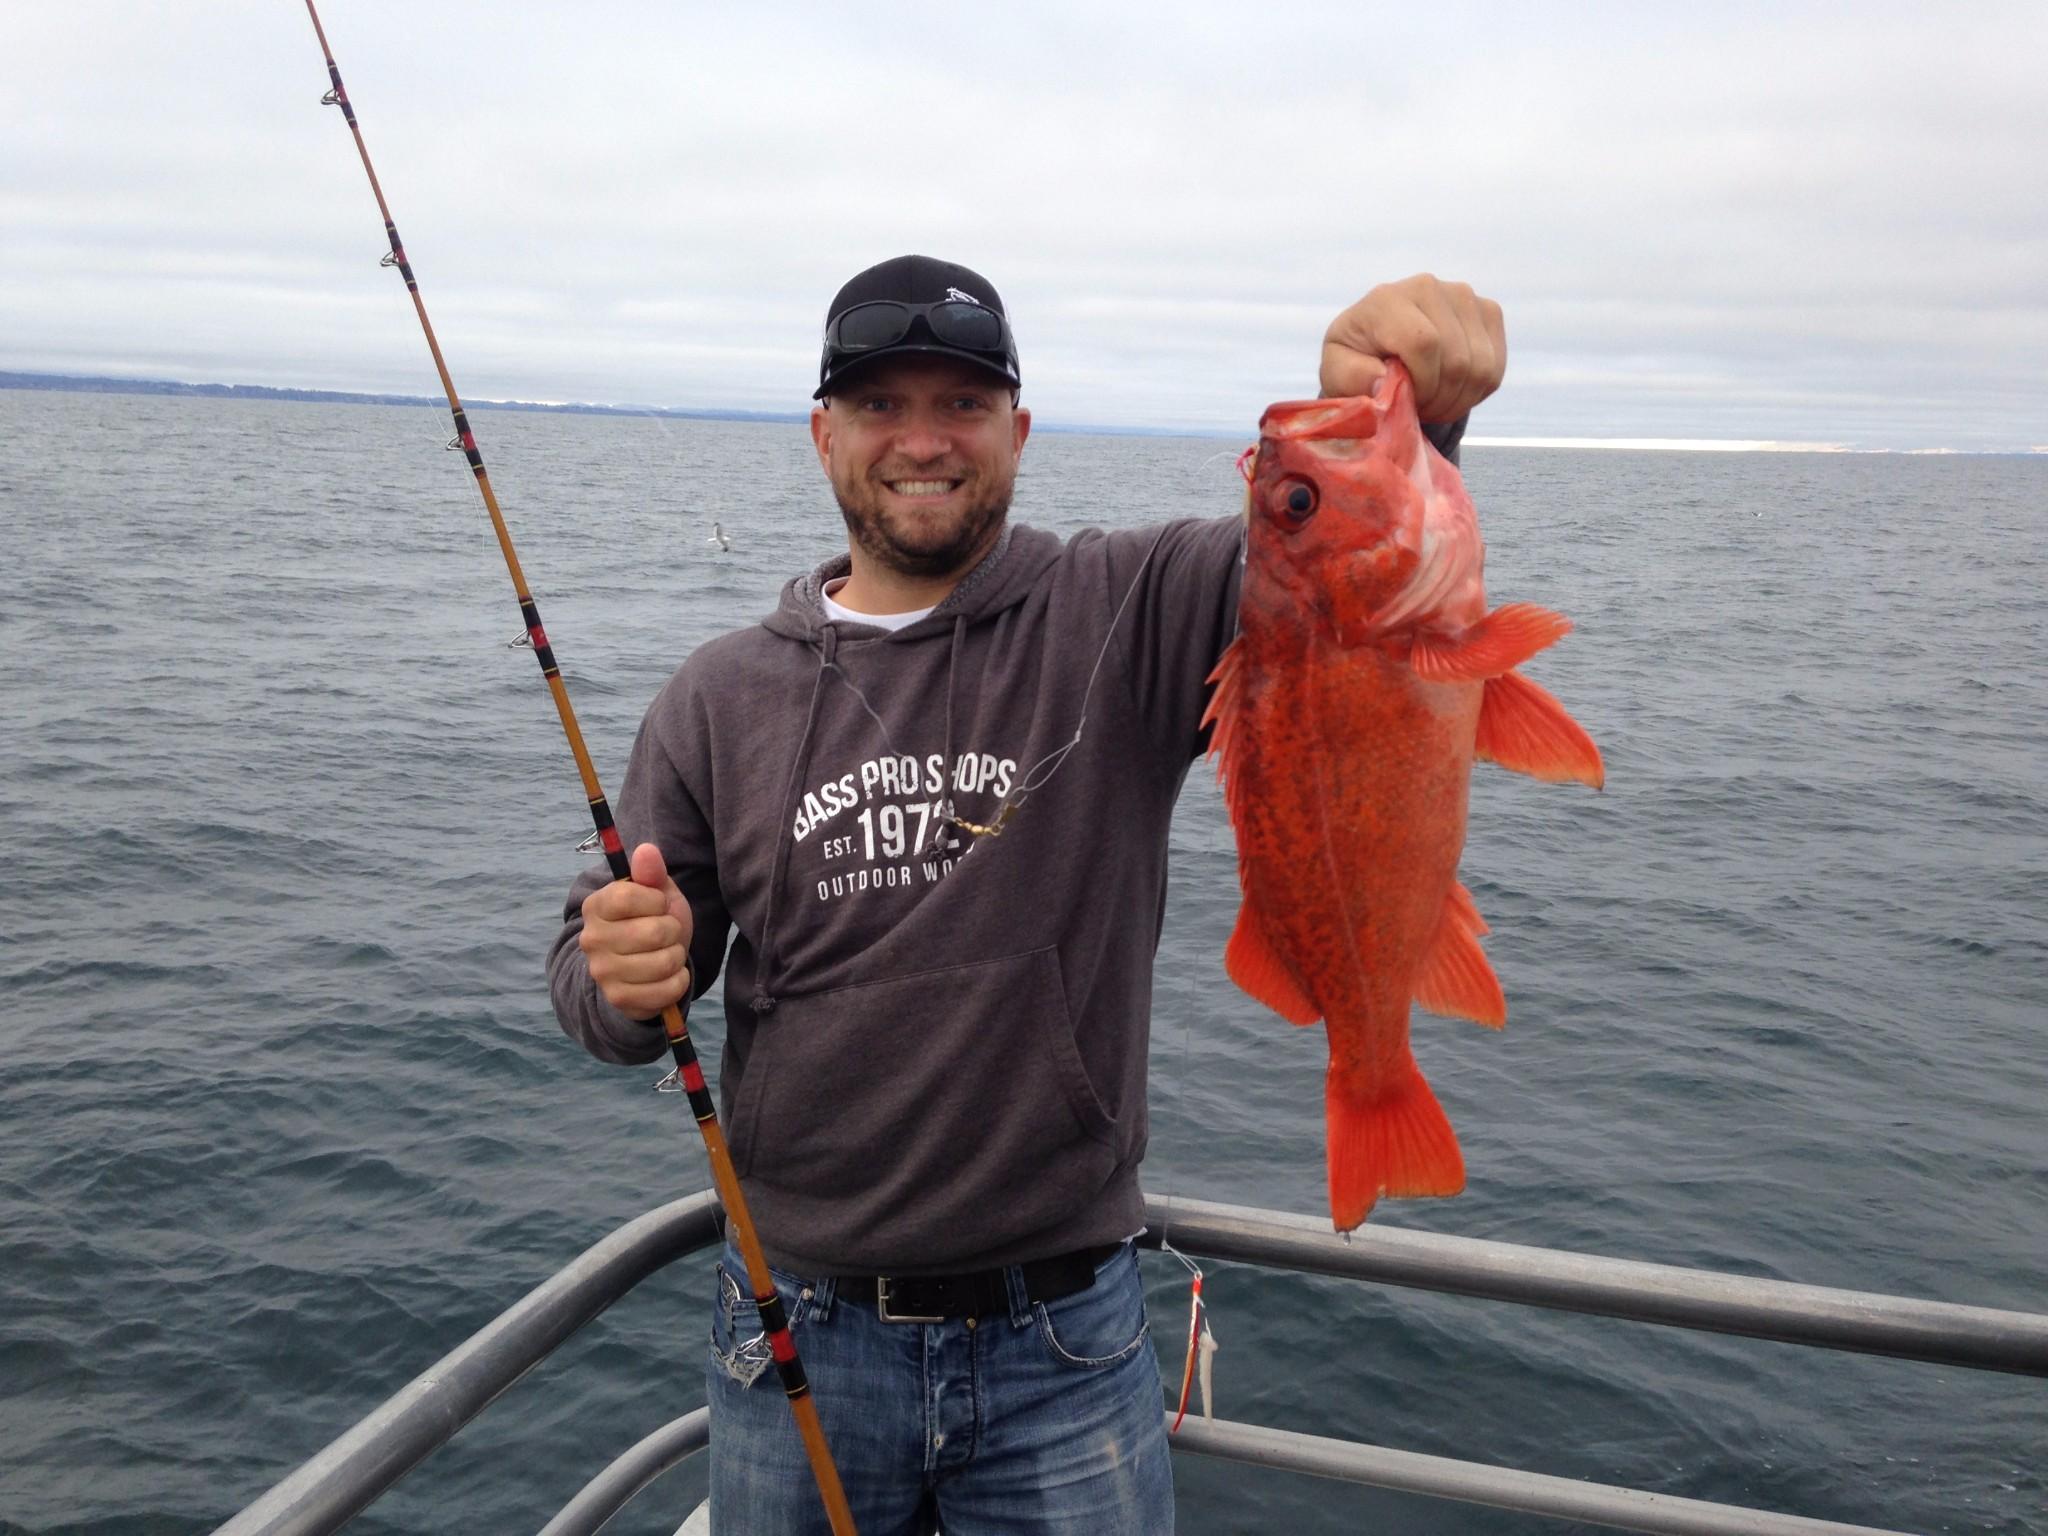 Summer fishing santa cruz waves for Santa cruz fishing report